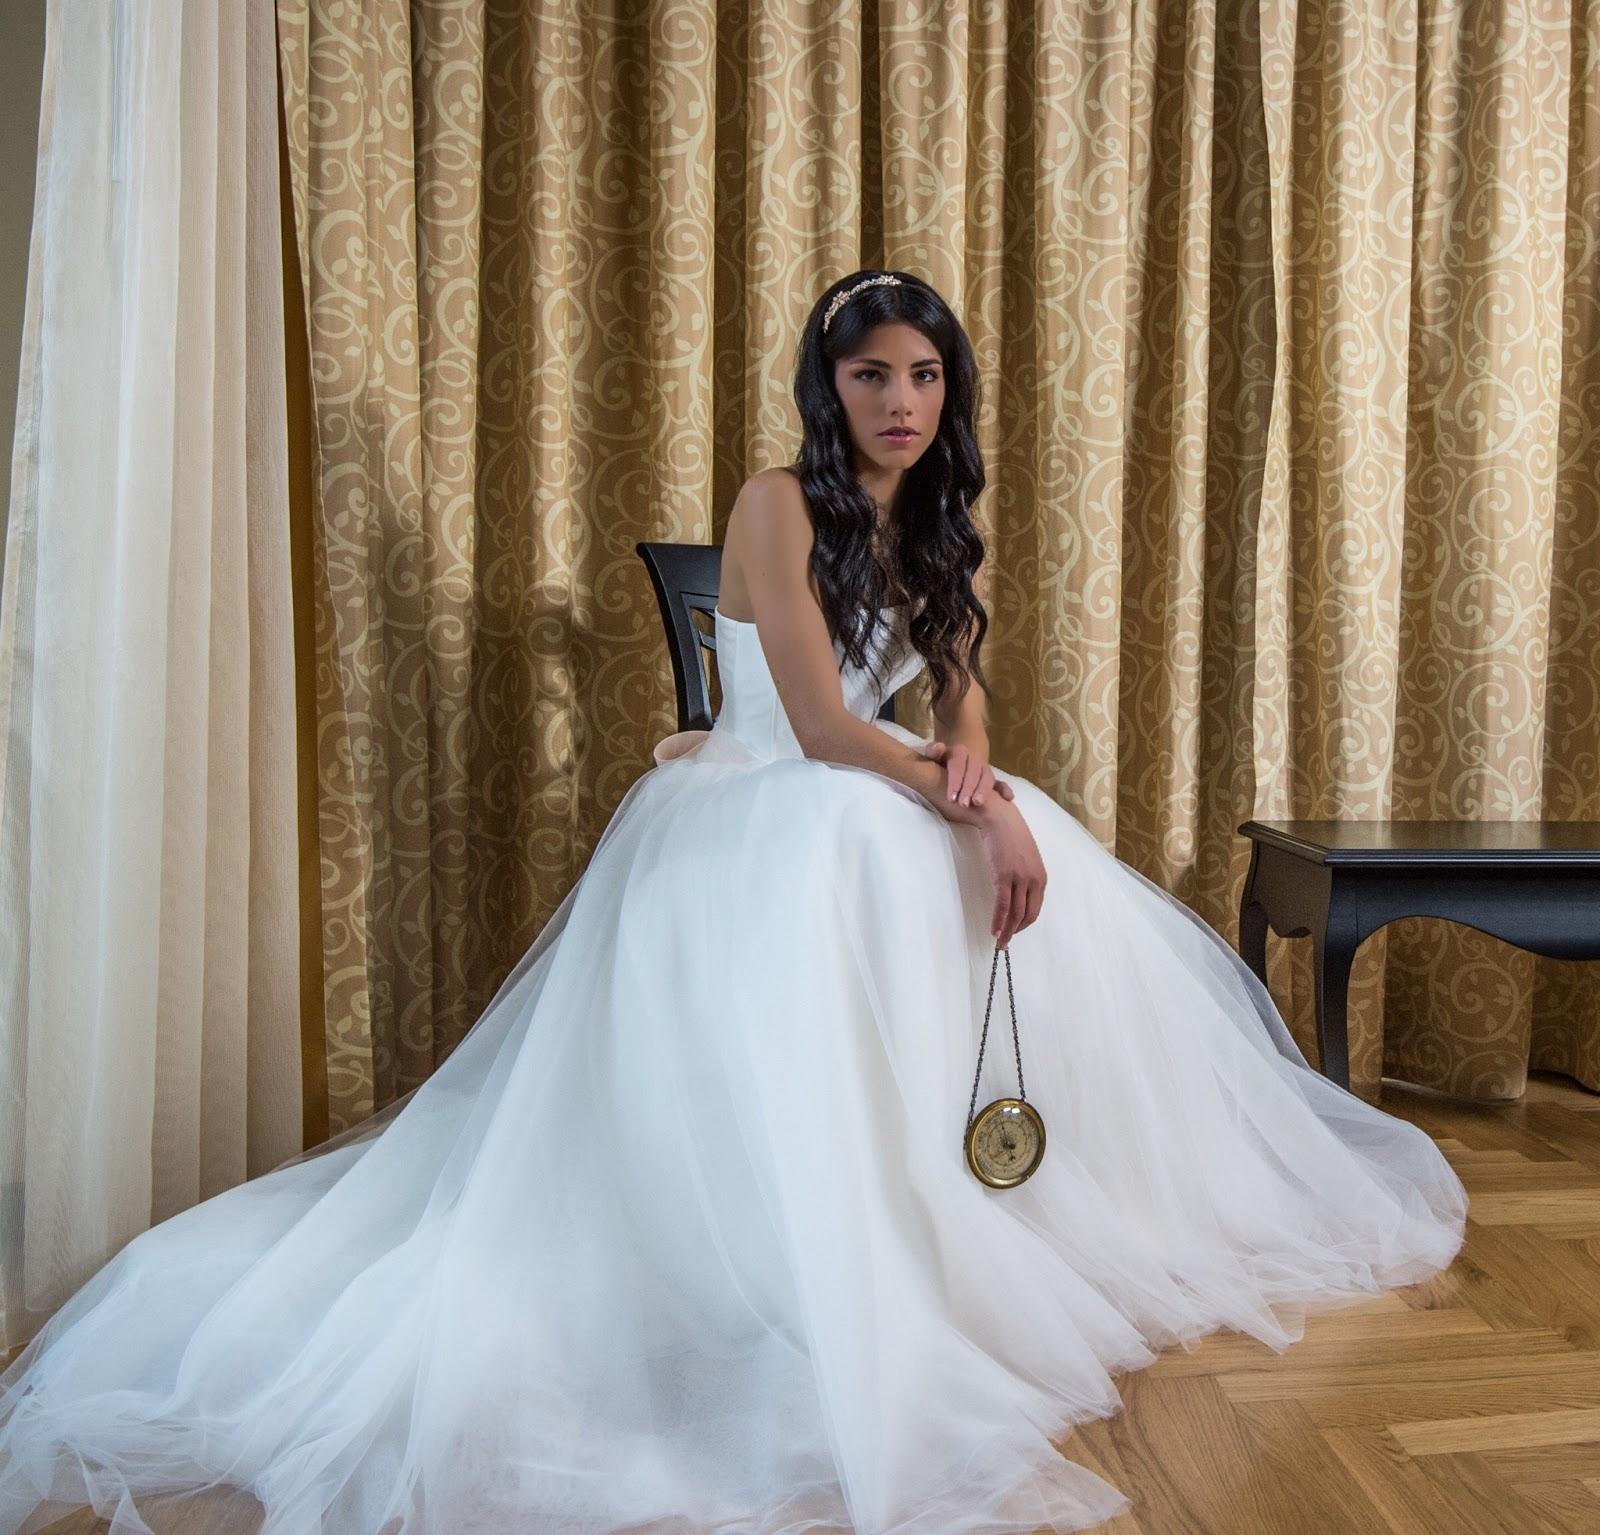 huge discount 9362b 55c5b Matrimonio Moderno - Il Wedding blog per Spose moderne e ...